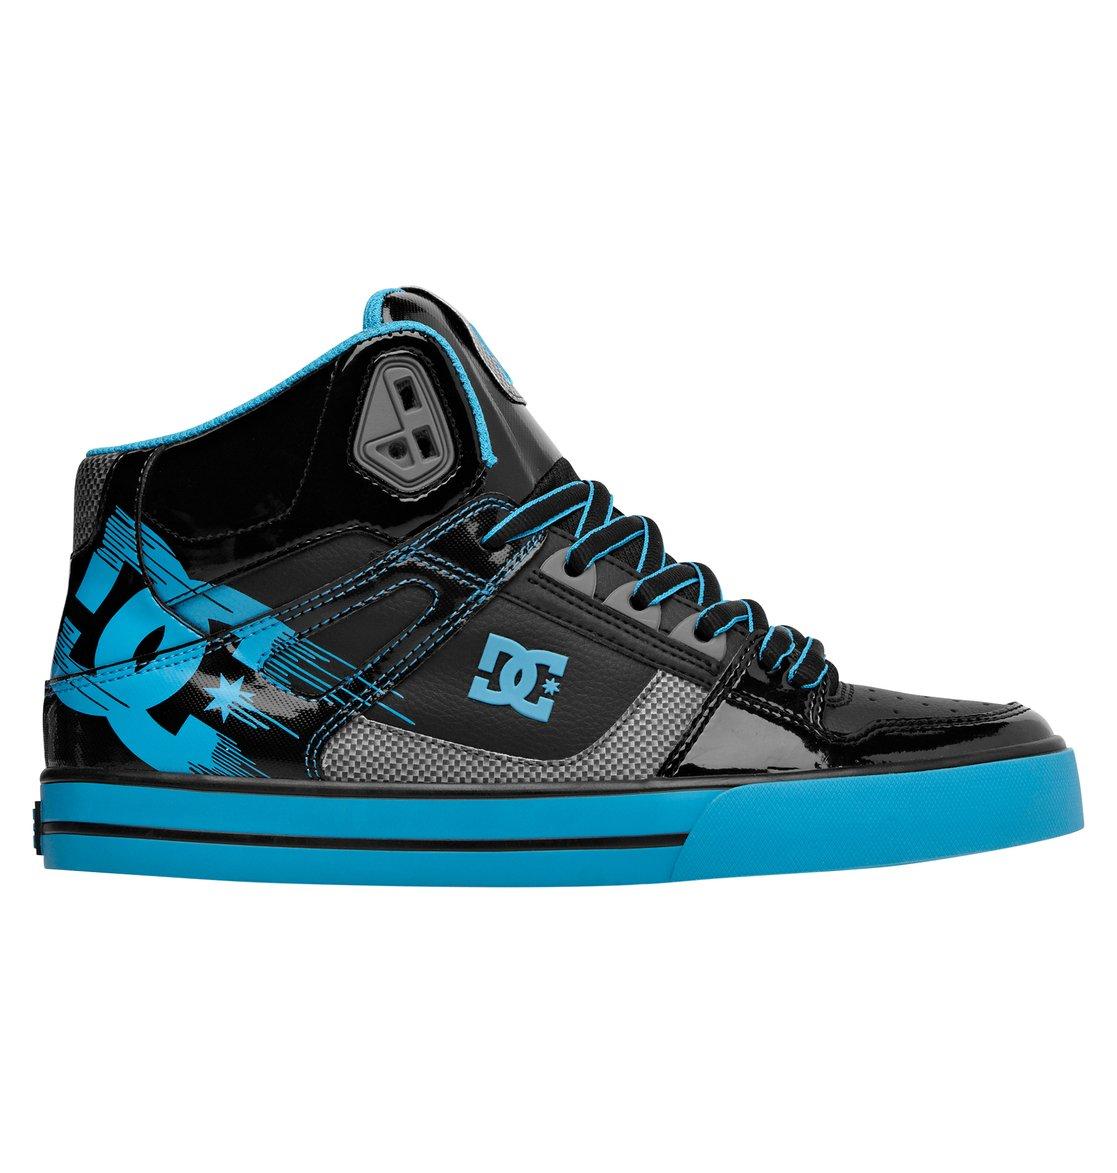 b095b792cb47 0 Men s SPARTAN HIGH WC Robbie Maddison Shoes ADYS400010 DC Shoes